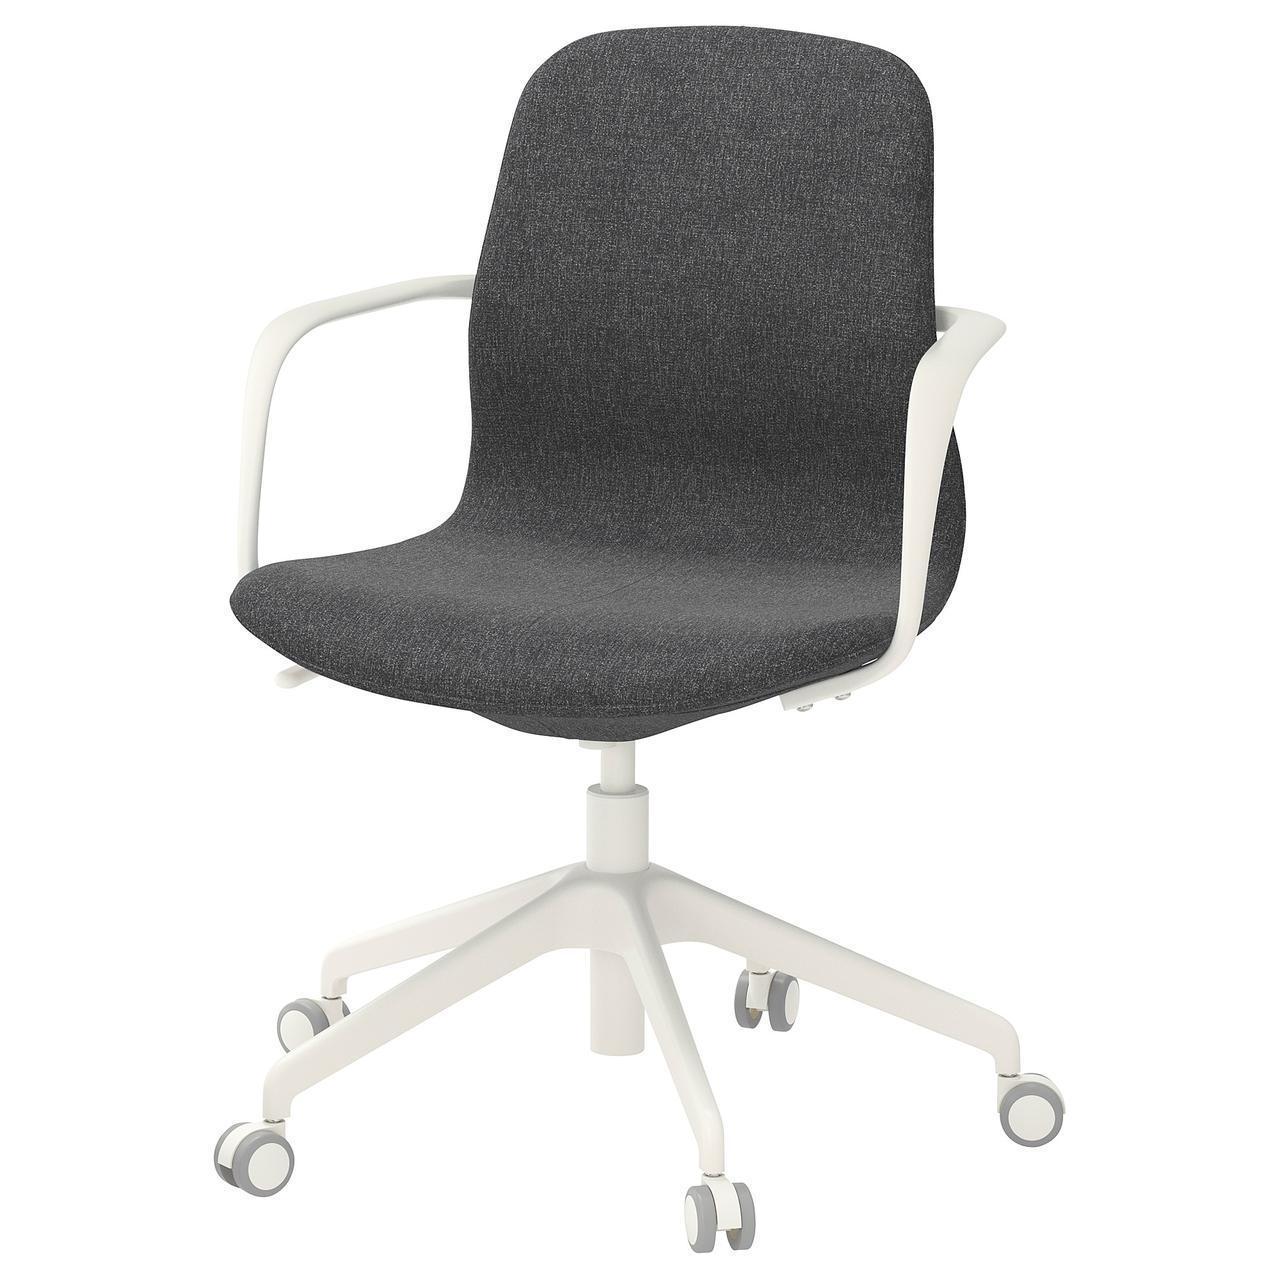 Комп'ютерне крісло IKEA LÅNGFJÄLL Gunnared темно-сіре біле 892.527.73